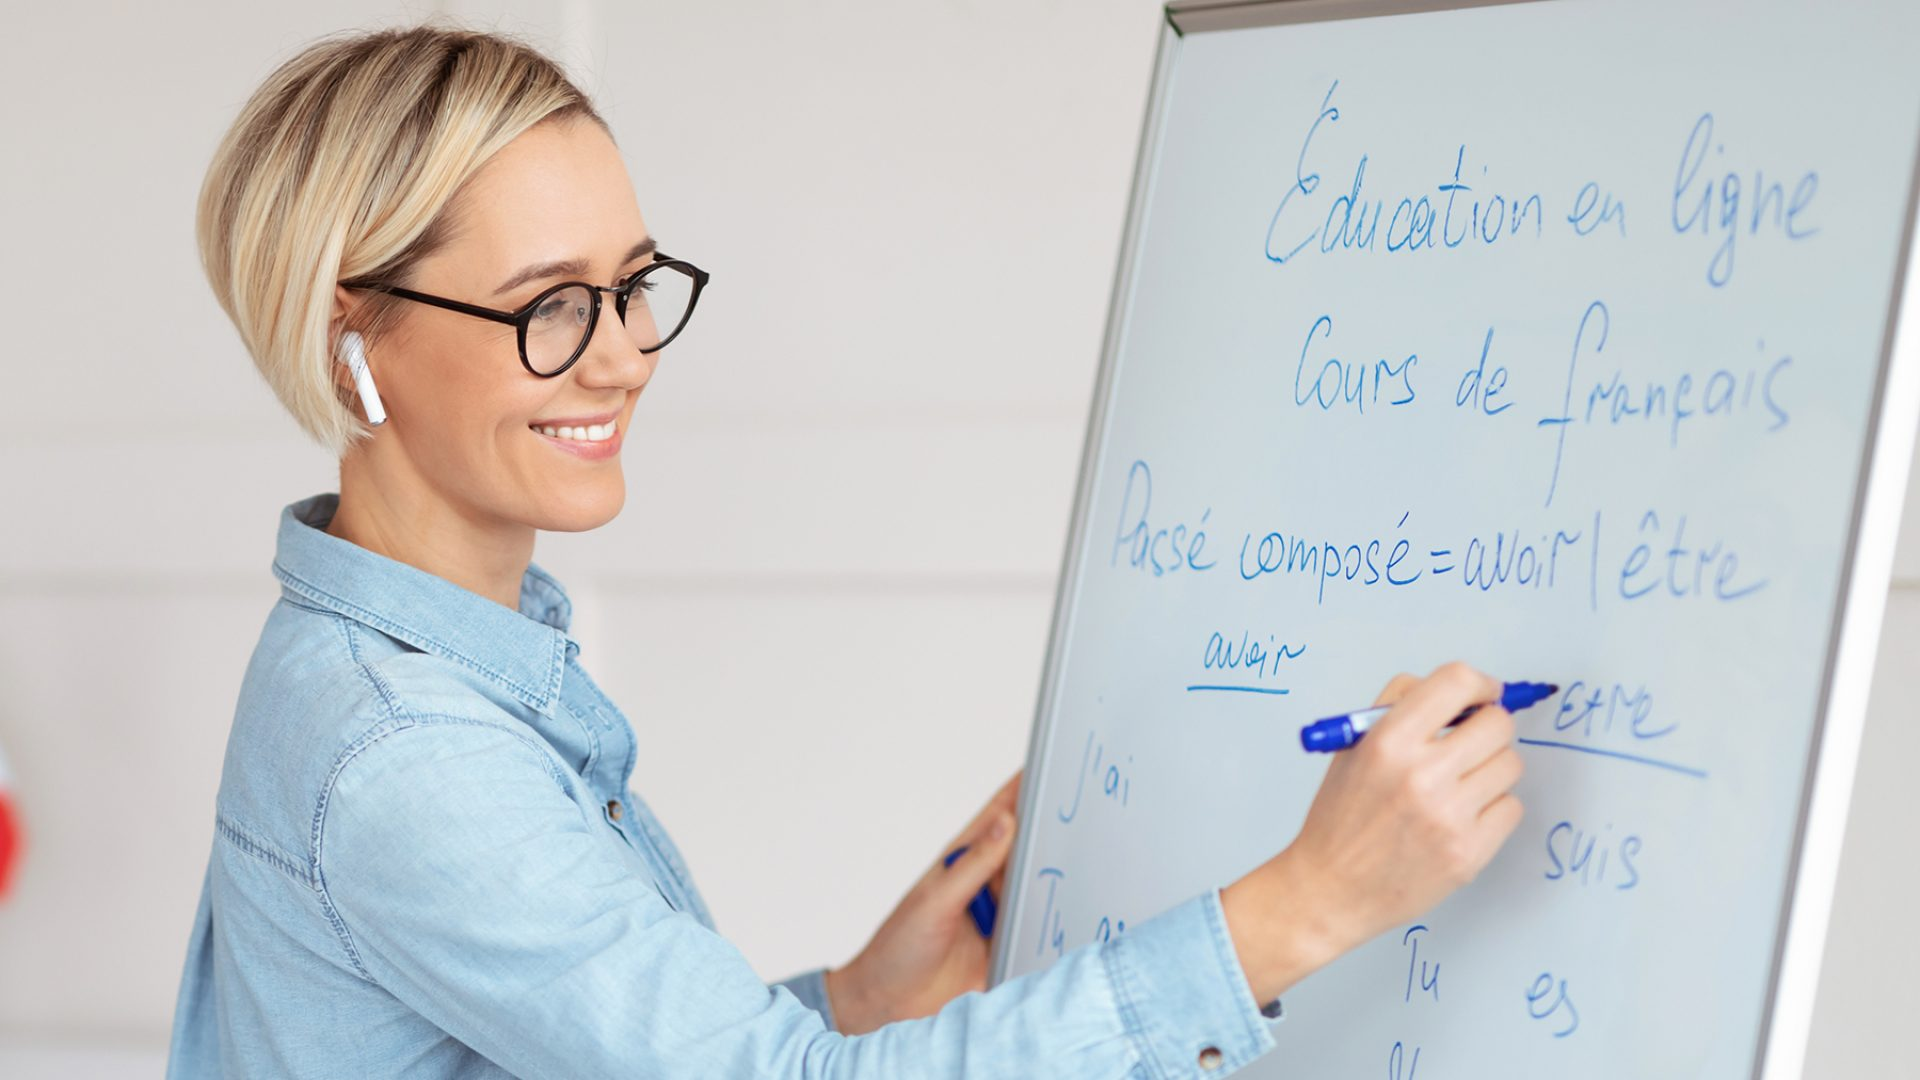 Learn French in Switzerland